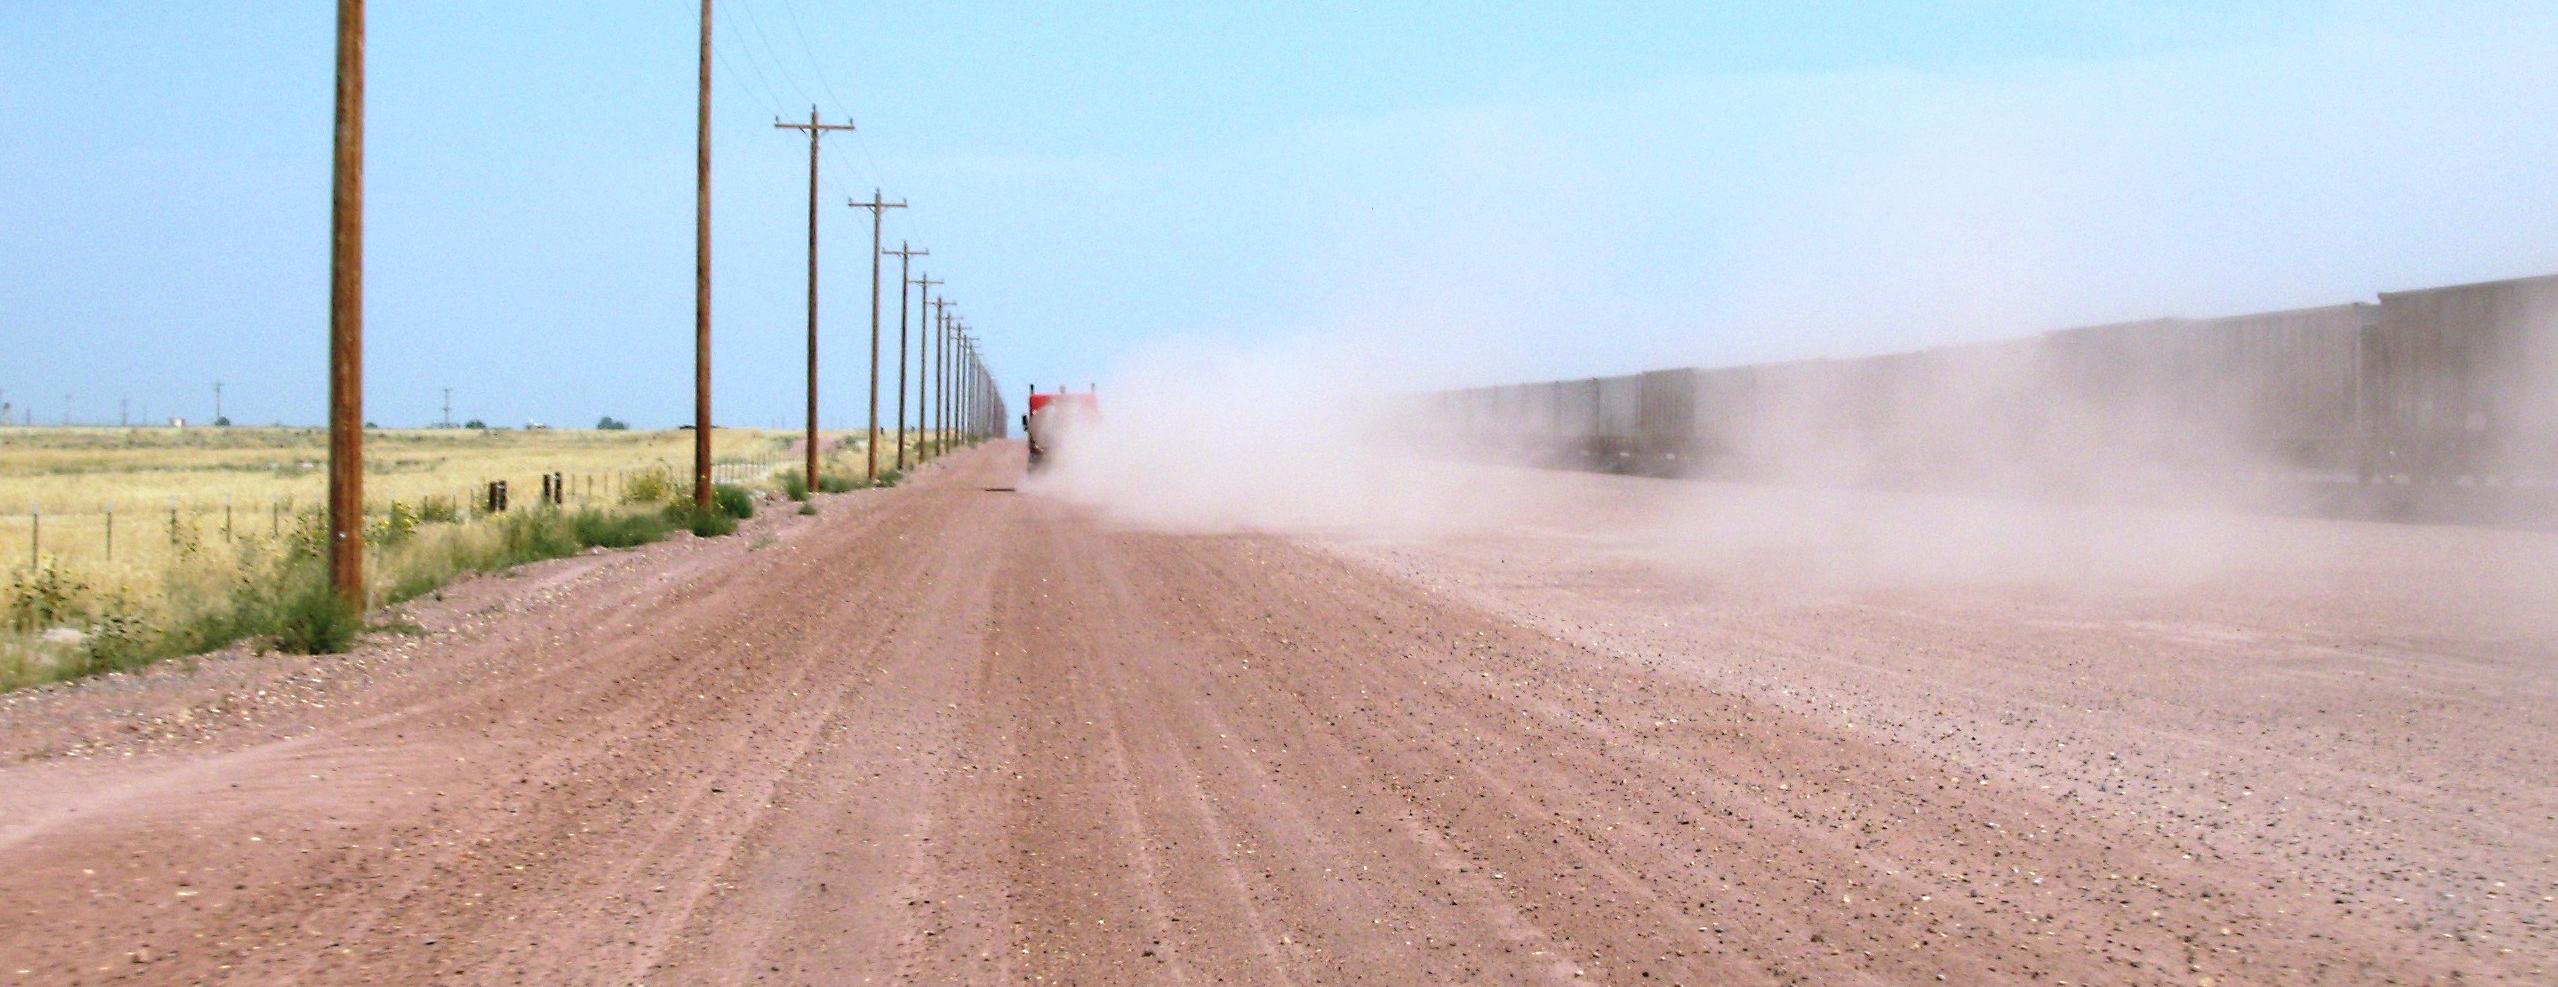 dirt-road-dust-control 5 Dirt Road Dust Control Challenges